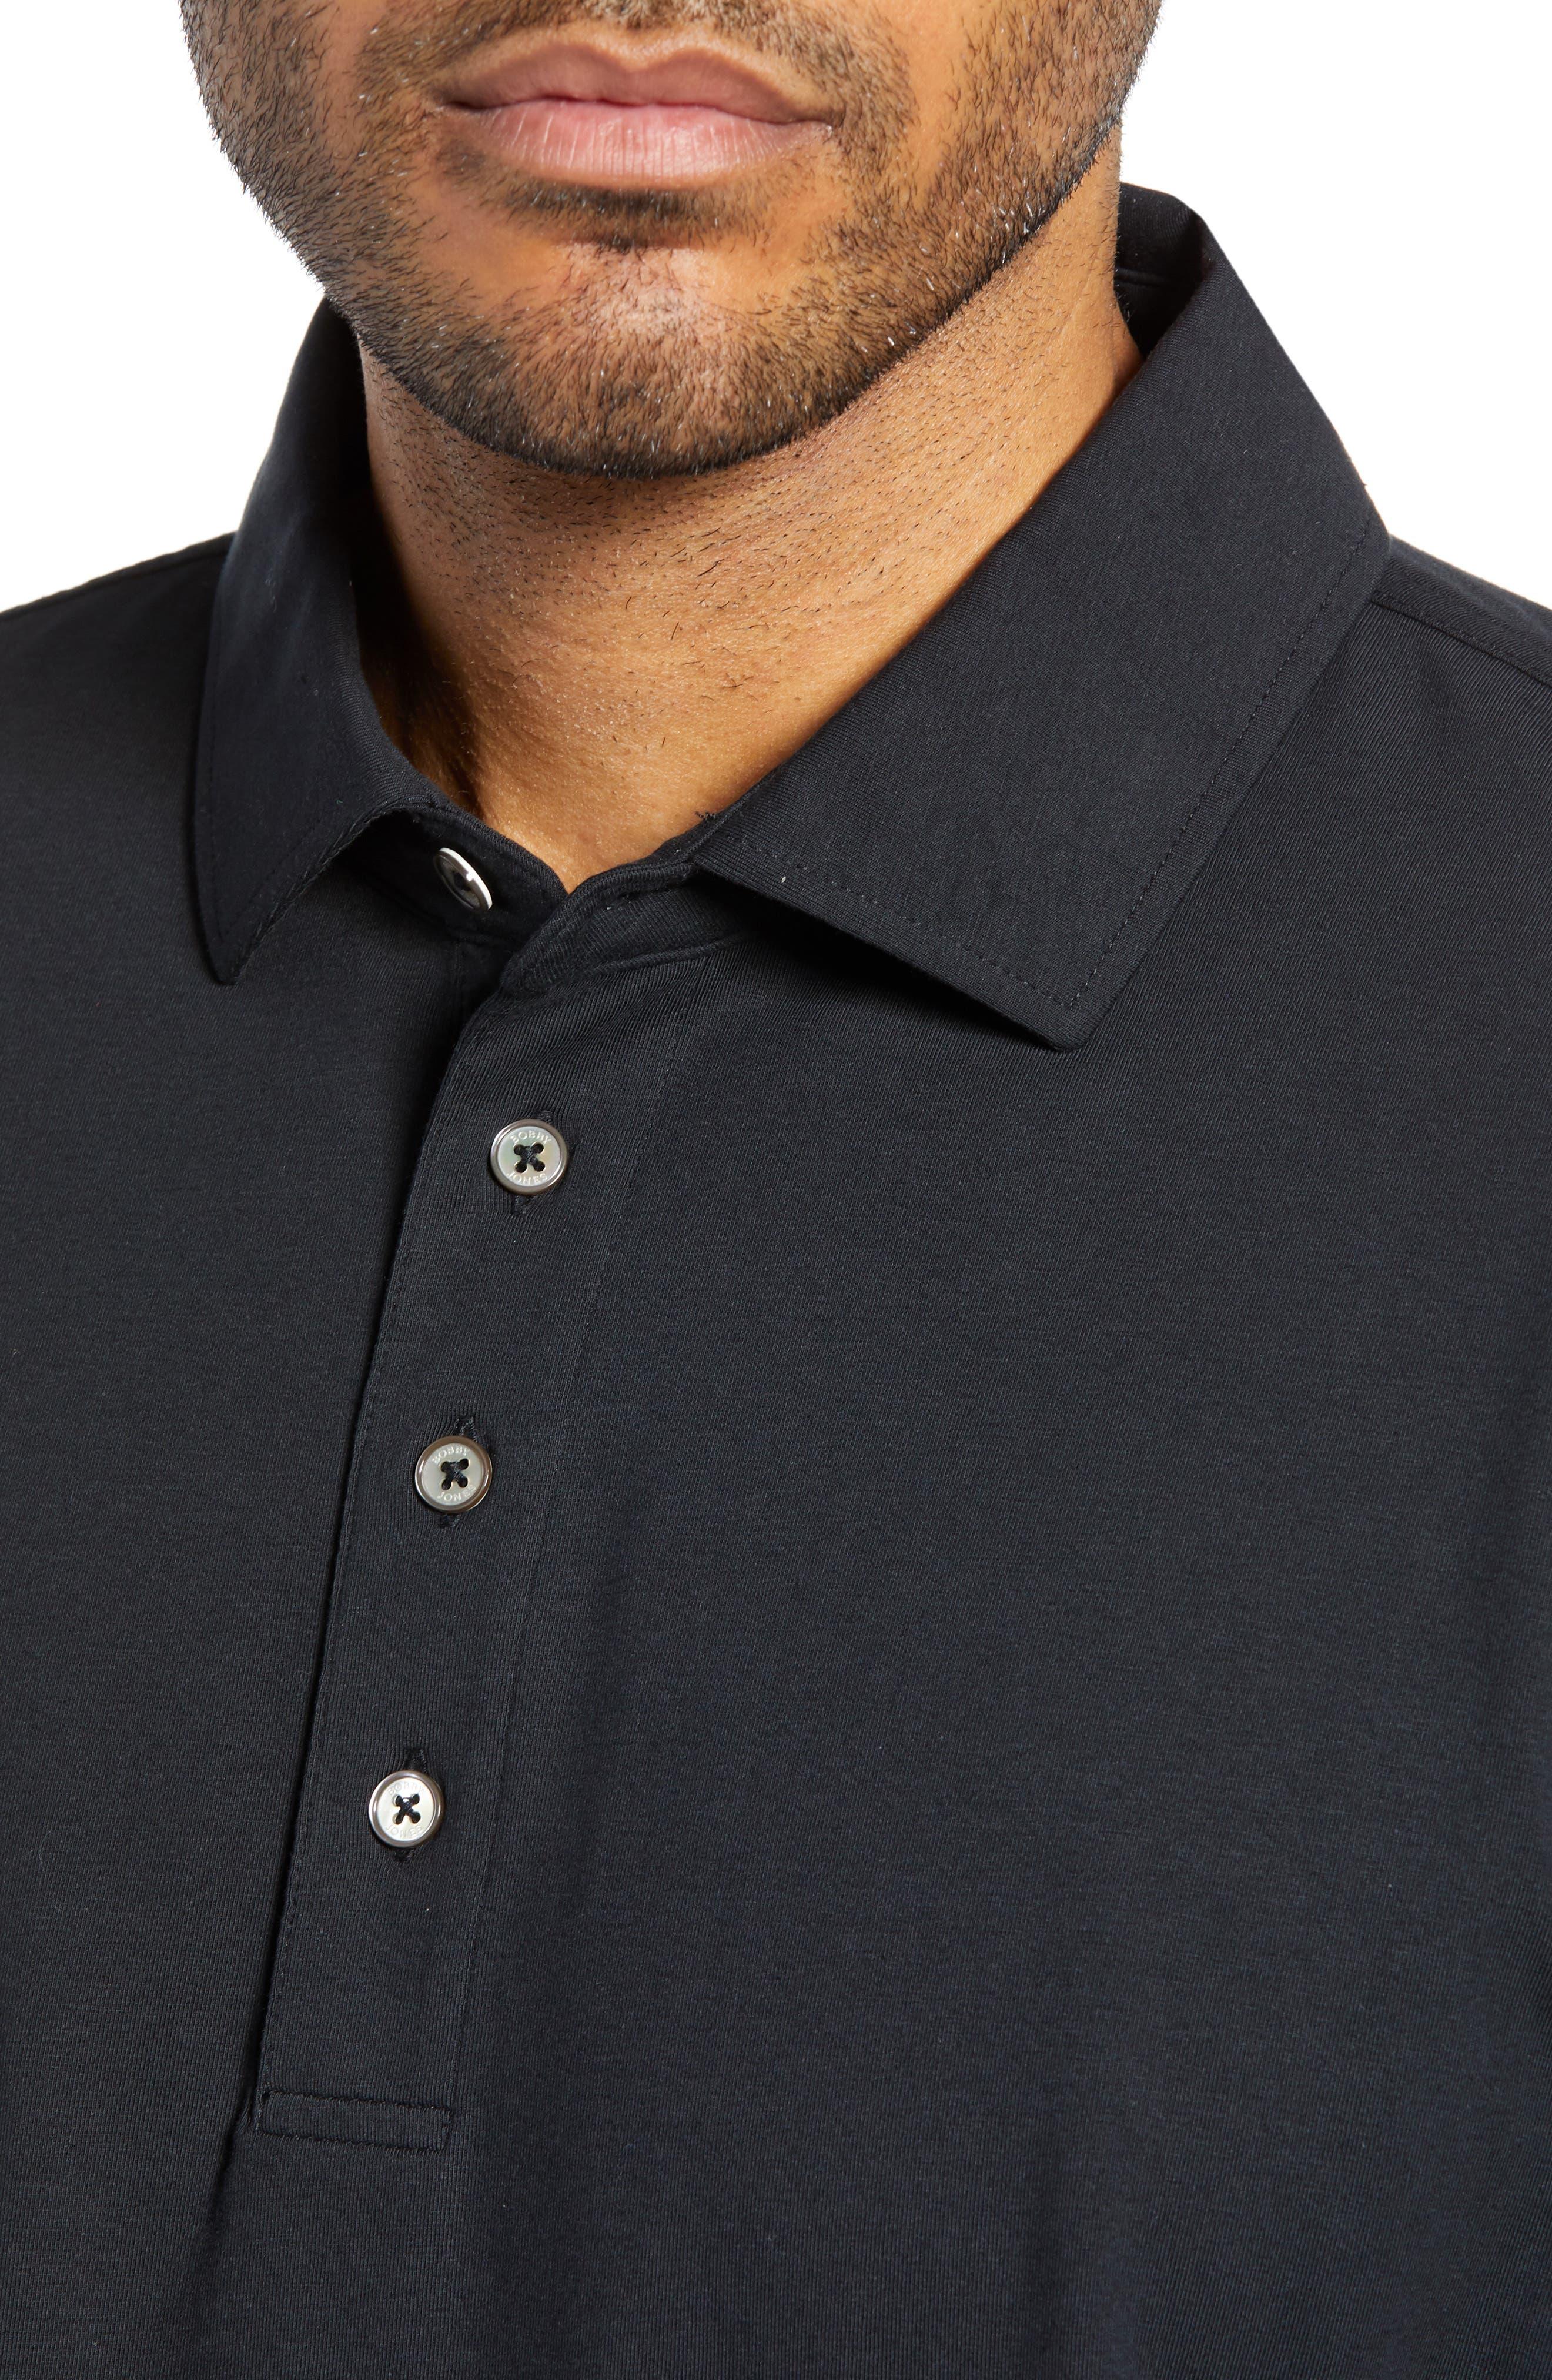 BOBBY JONES,                             Liquid Cotton Stretch Jersey Polo,                             Alternate thumbnail 4, color,                             BLACK